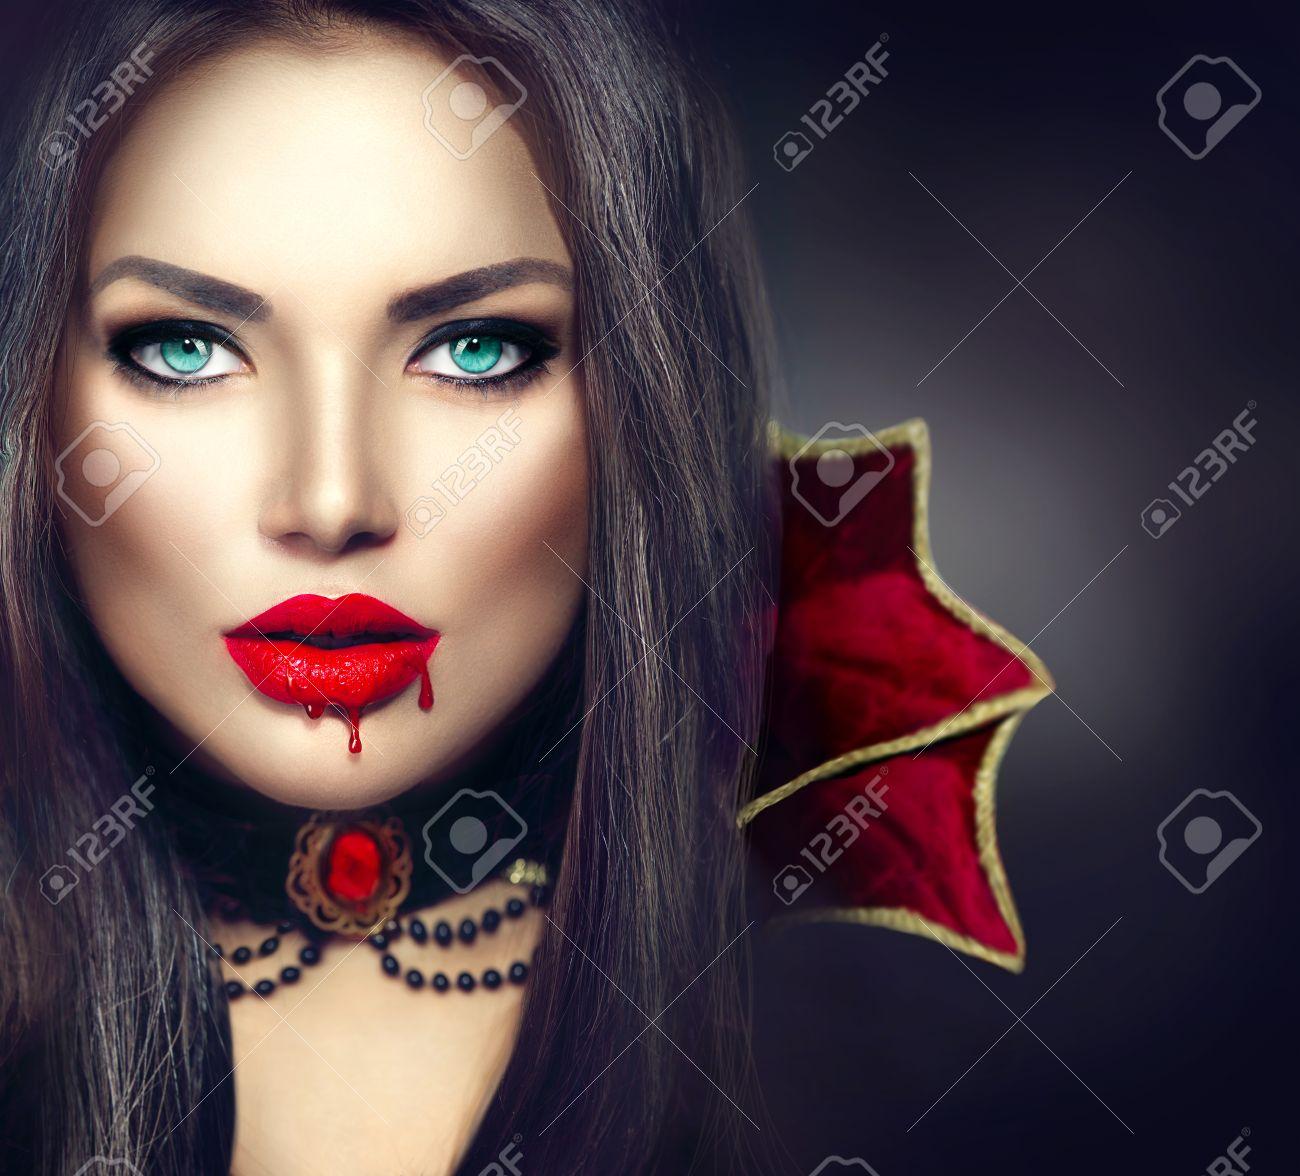 Красивый женский рот онлайн